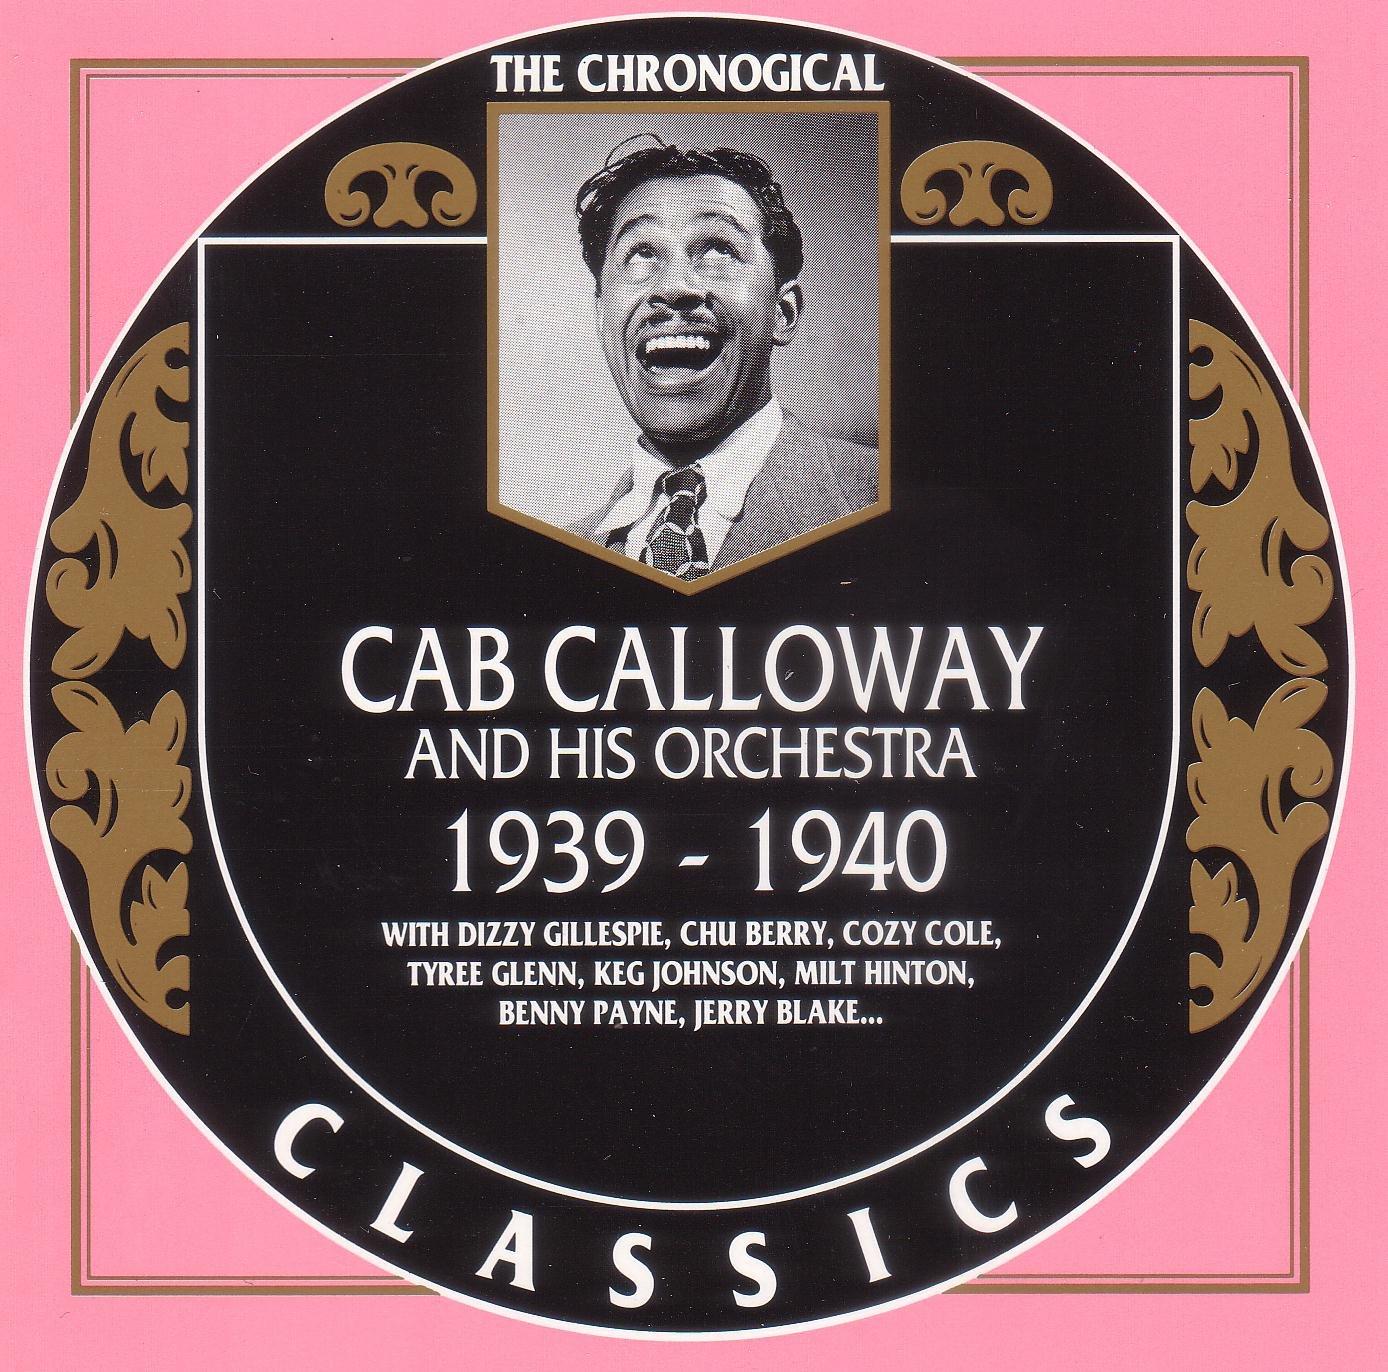 Cab Calloway 1939 1940